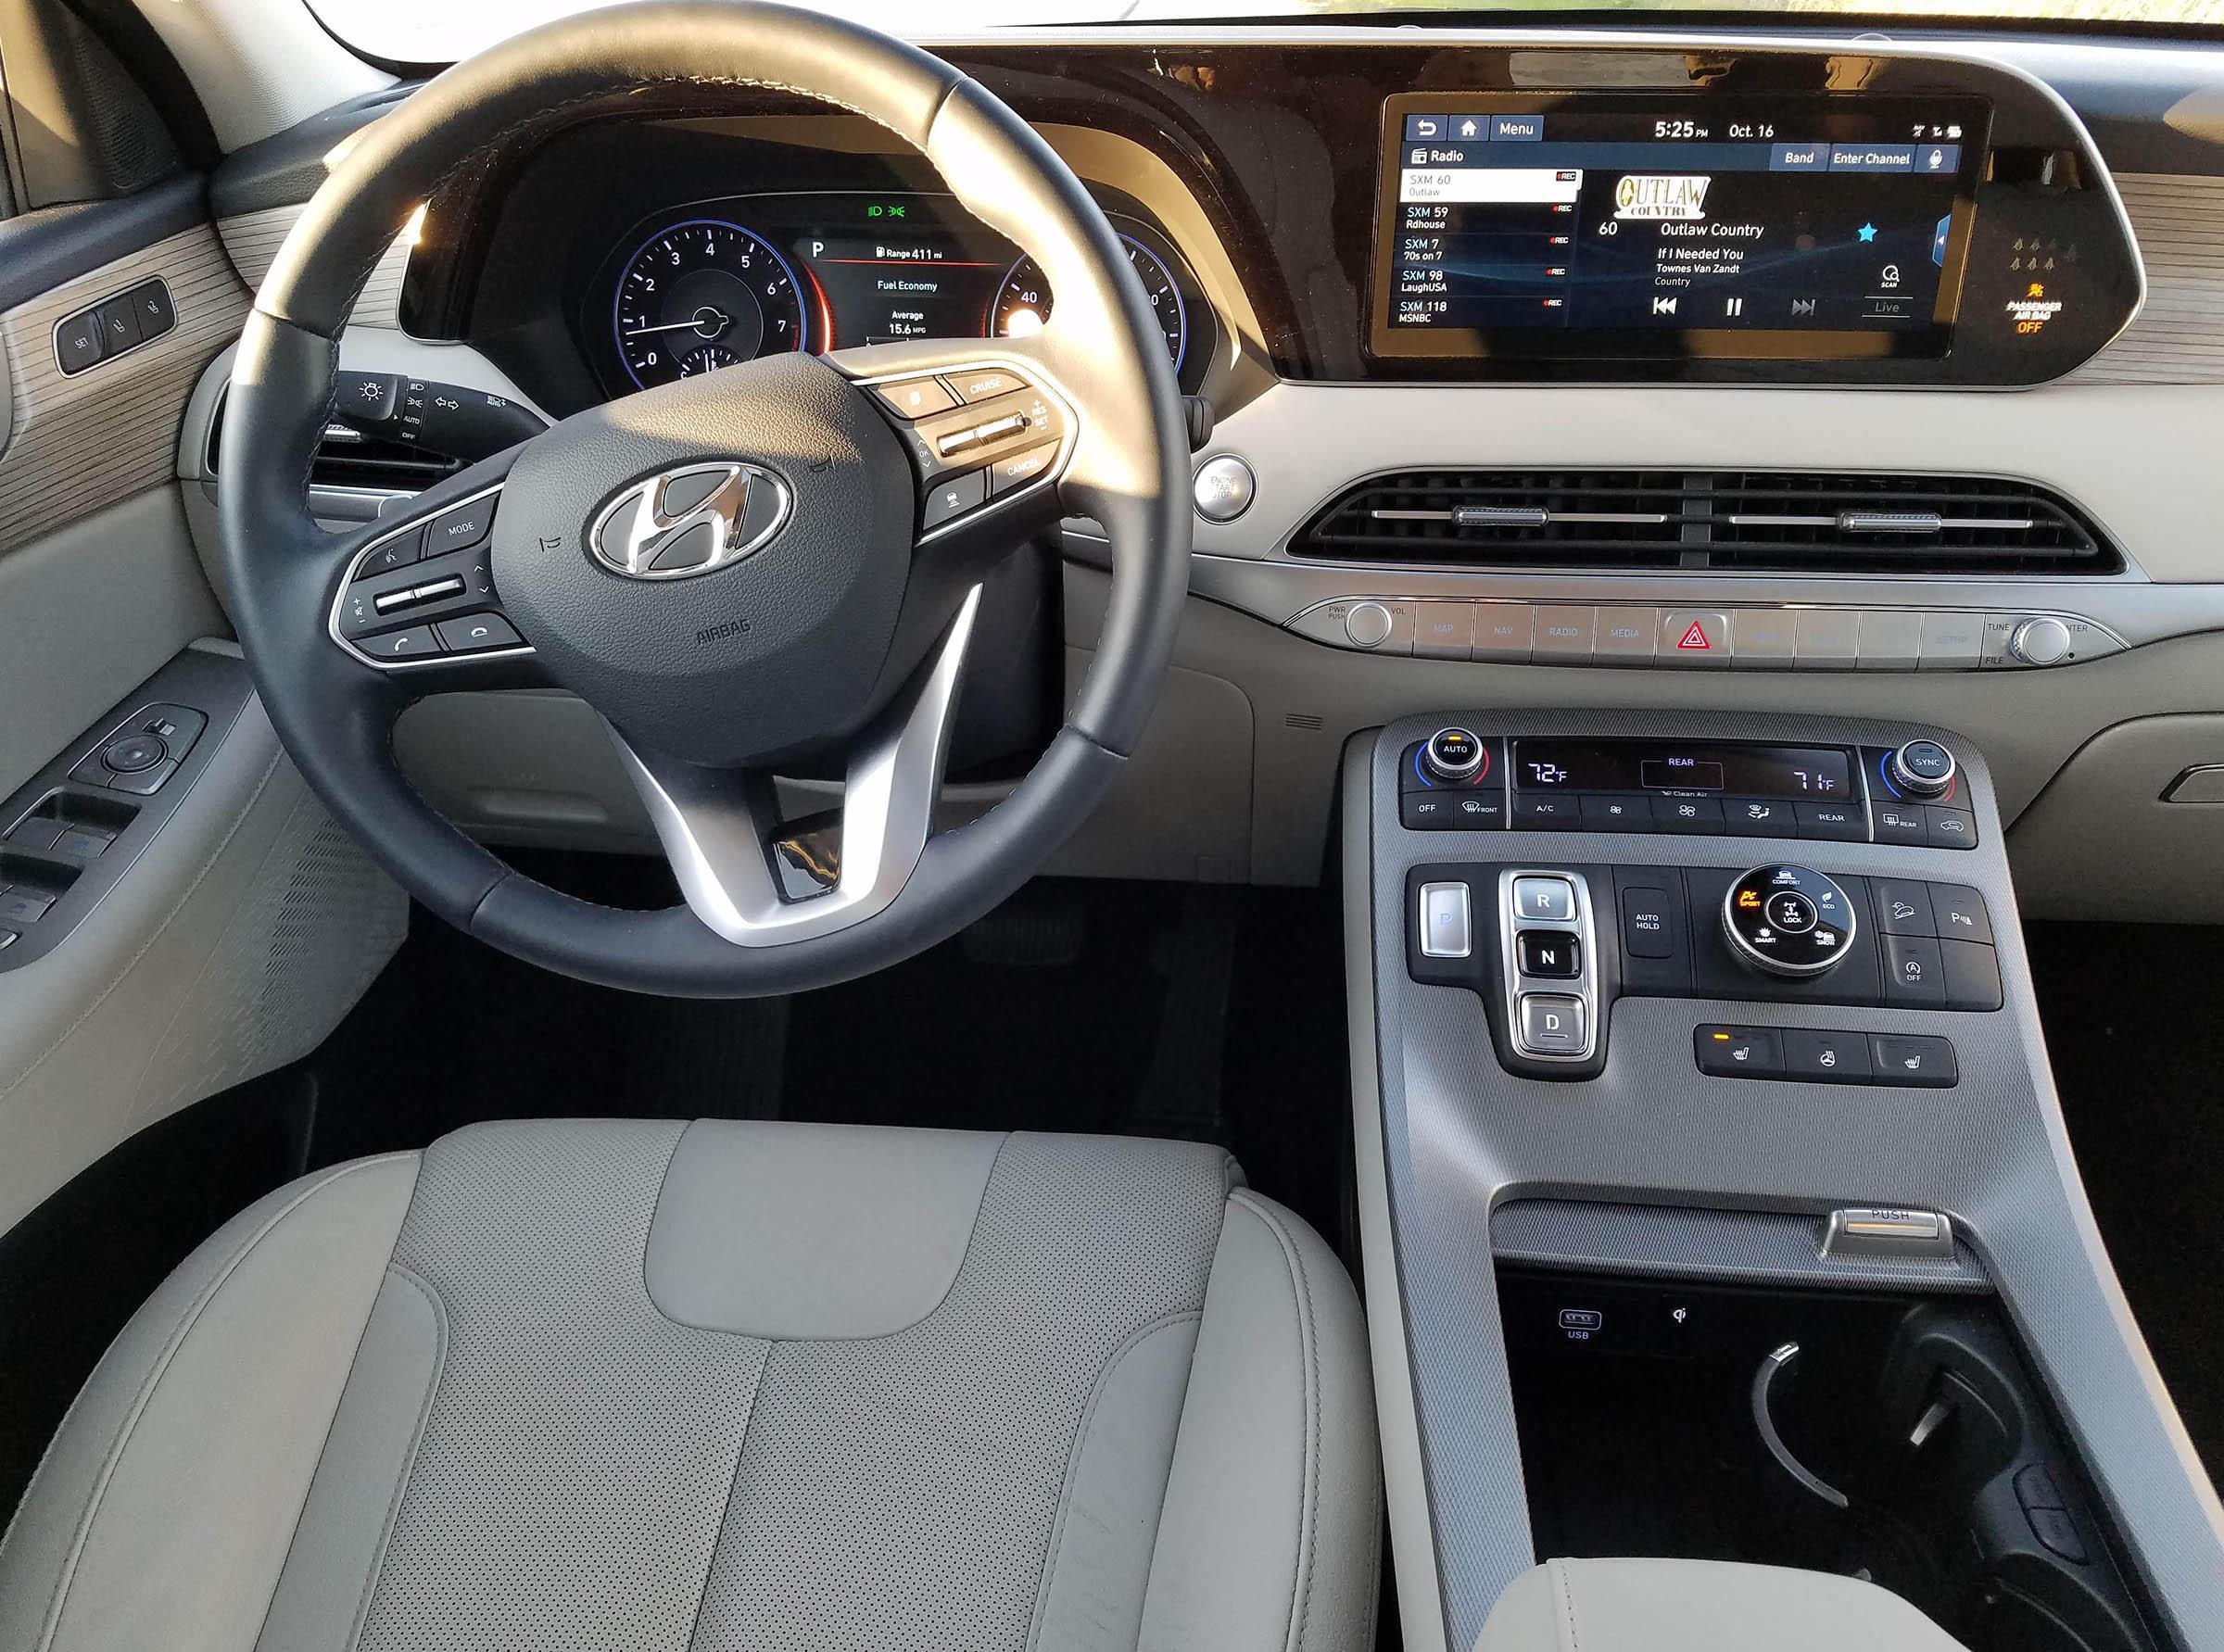 2020 Hyundai Palisade Sel Awd Review Wuwm